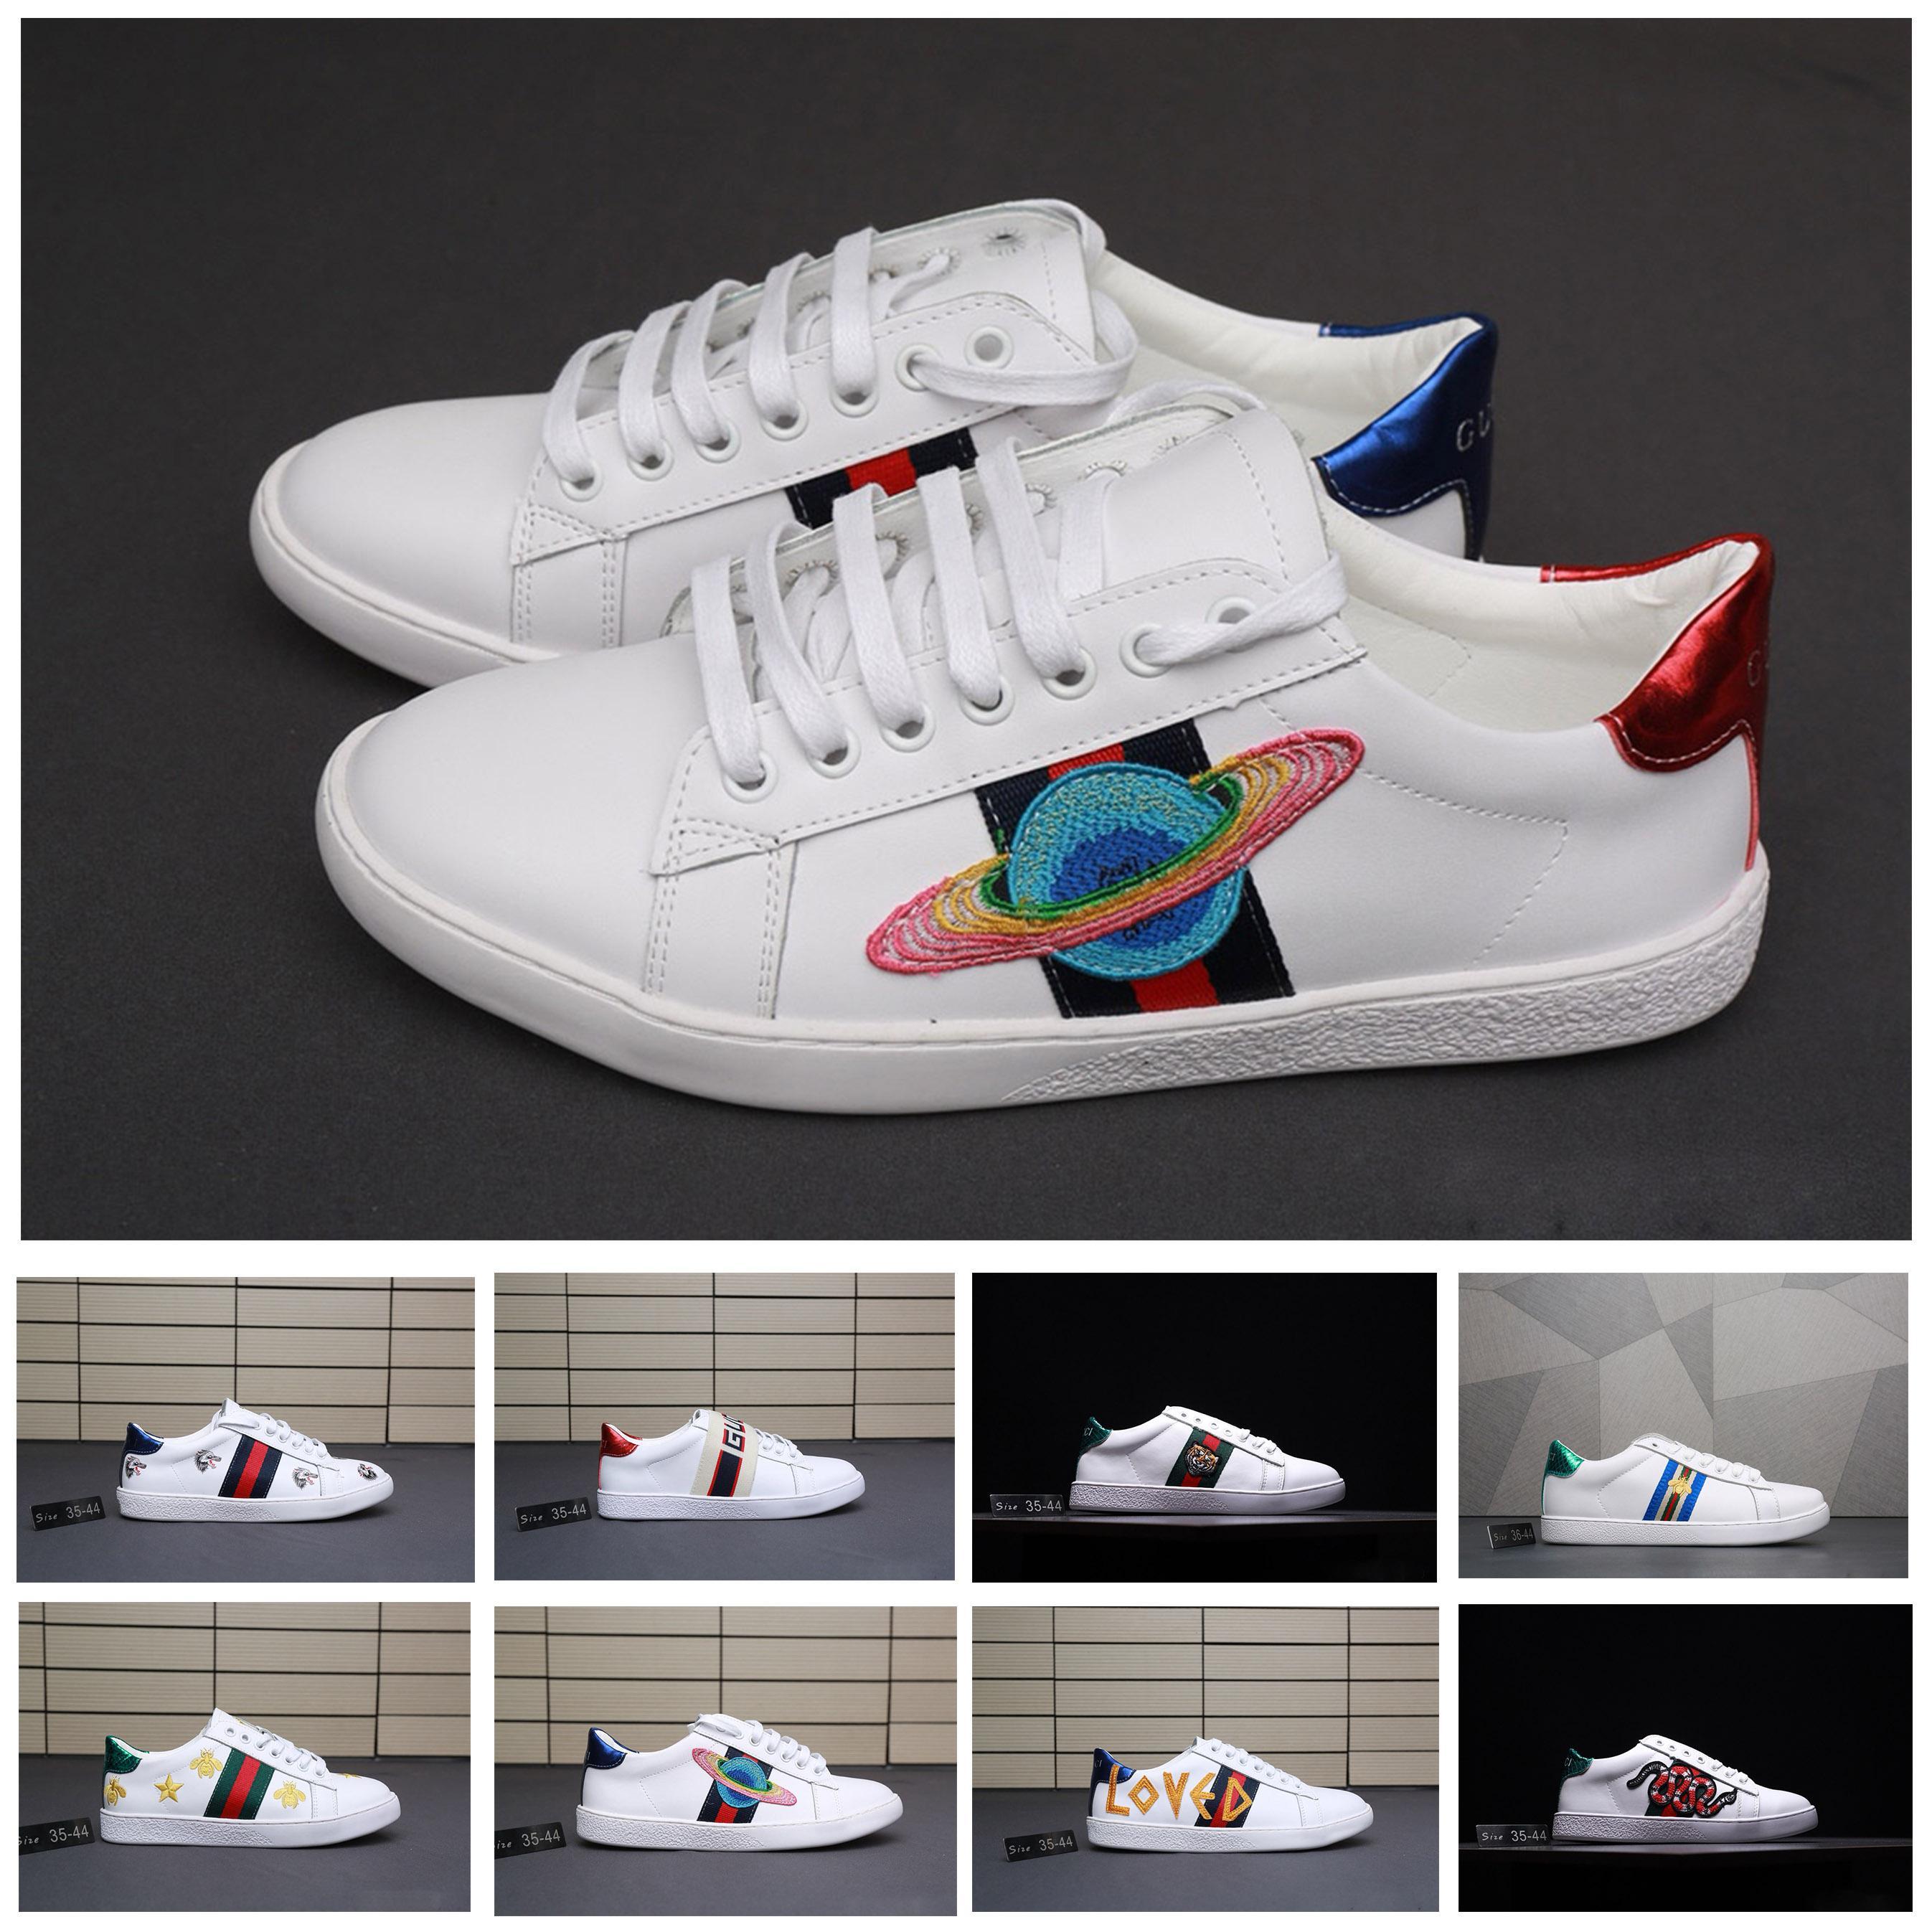 6946ec5a04 Acquista GUCCI Shoes Gucci Men Shoes Scarpe Da Uomo Di Design Scarpe Di  Lusso Bianche Scarpe Da Ginnastica Casual Donna Zapatos Belle Scarpe Da  Ricamo ...